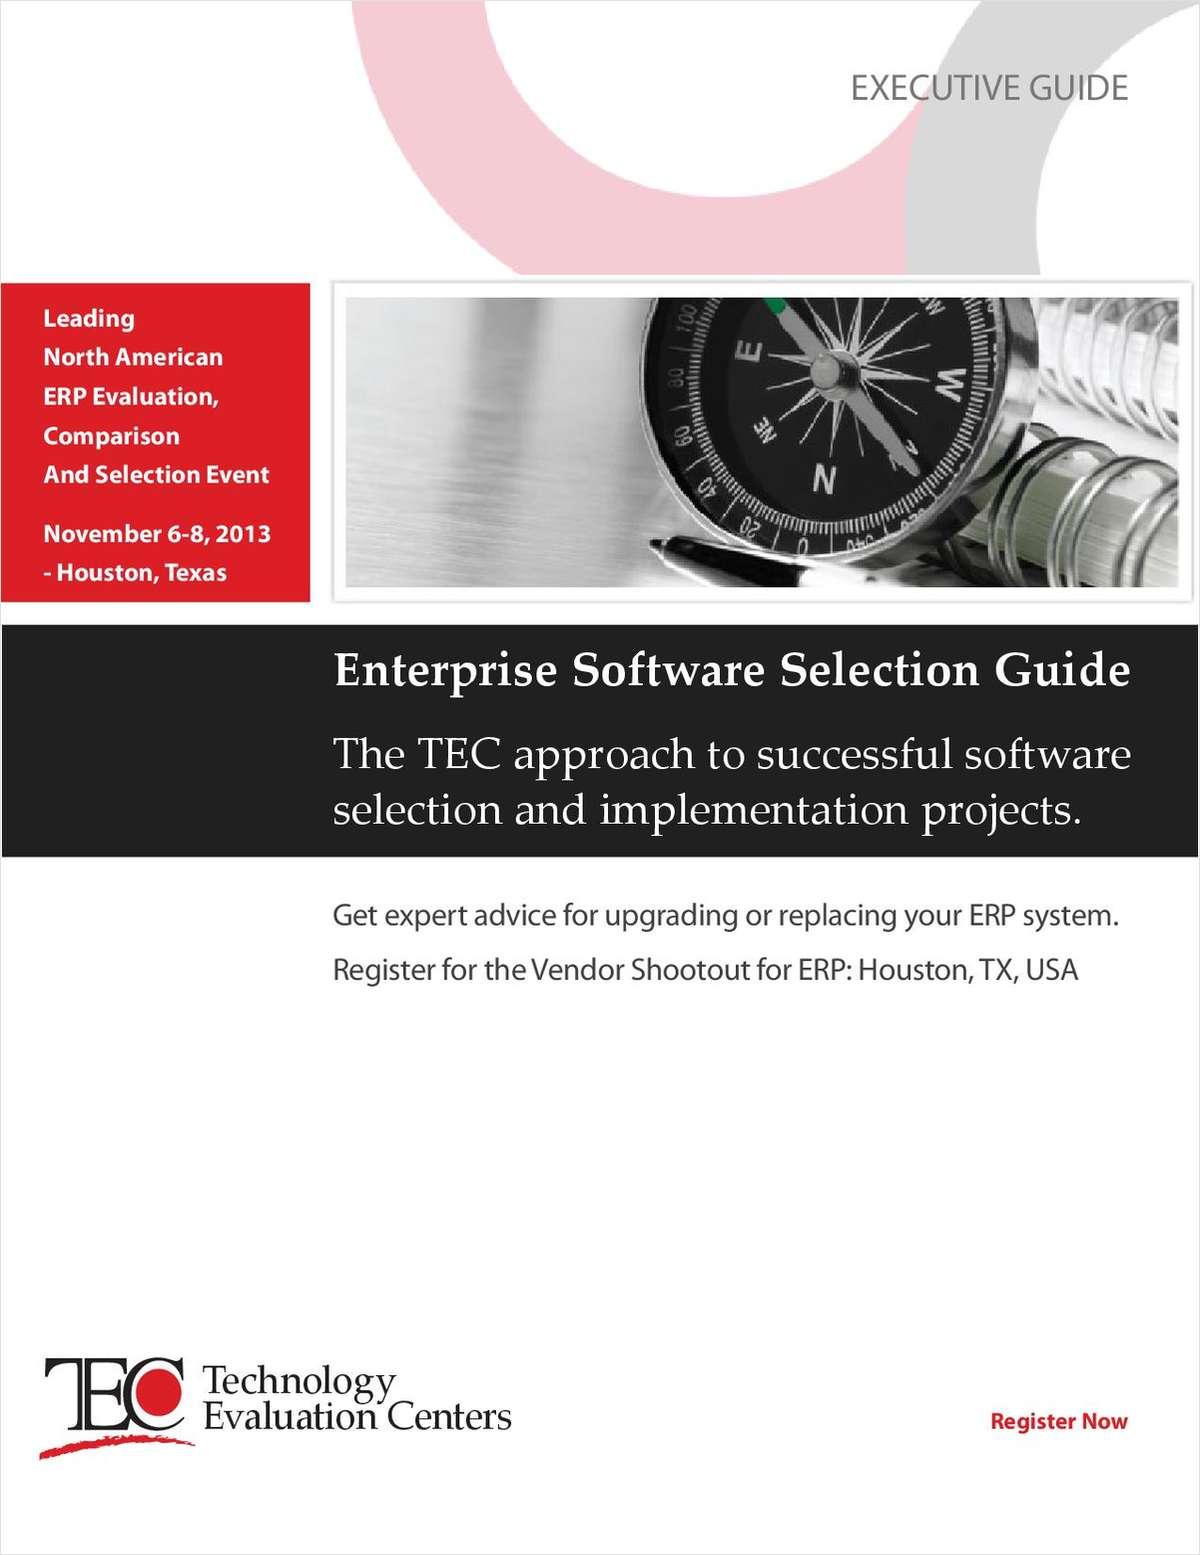 Executive Guide to Successful Enterprise Software Selection